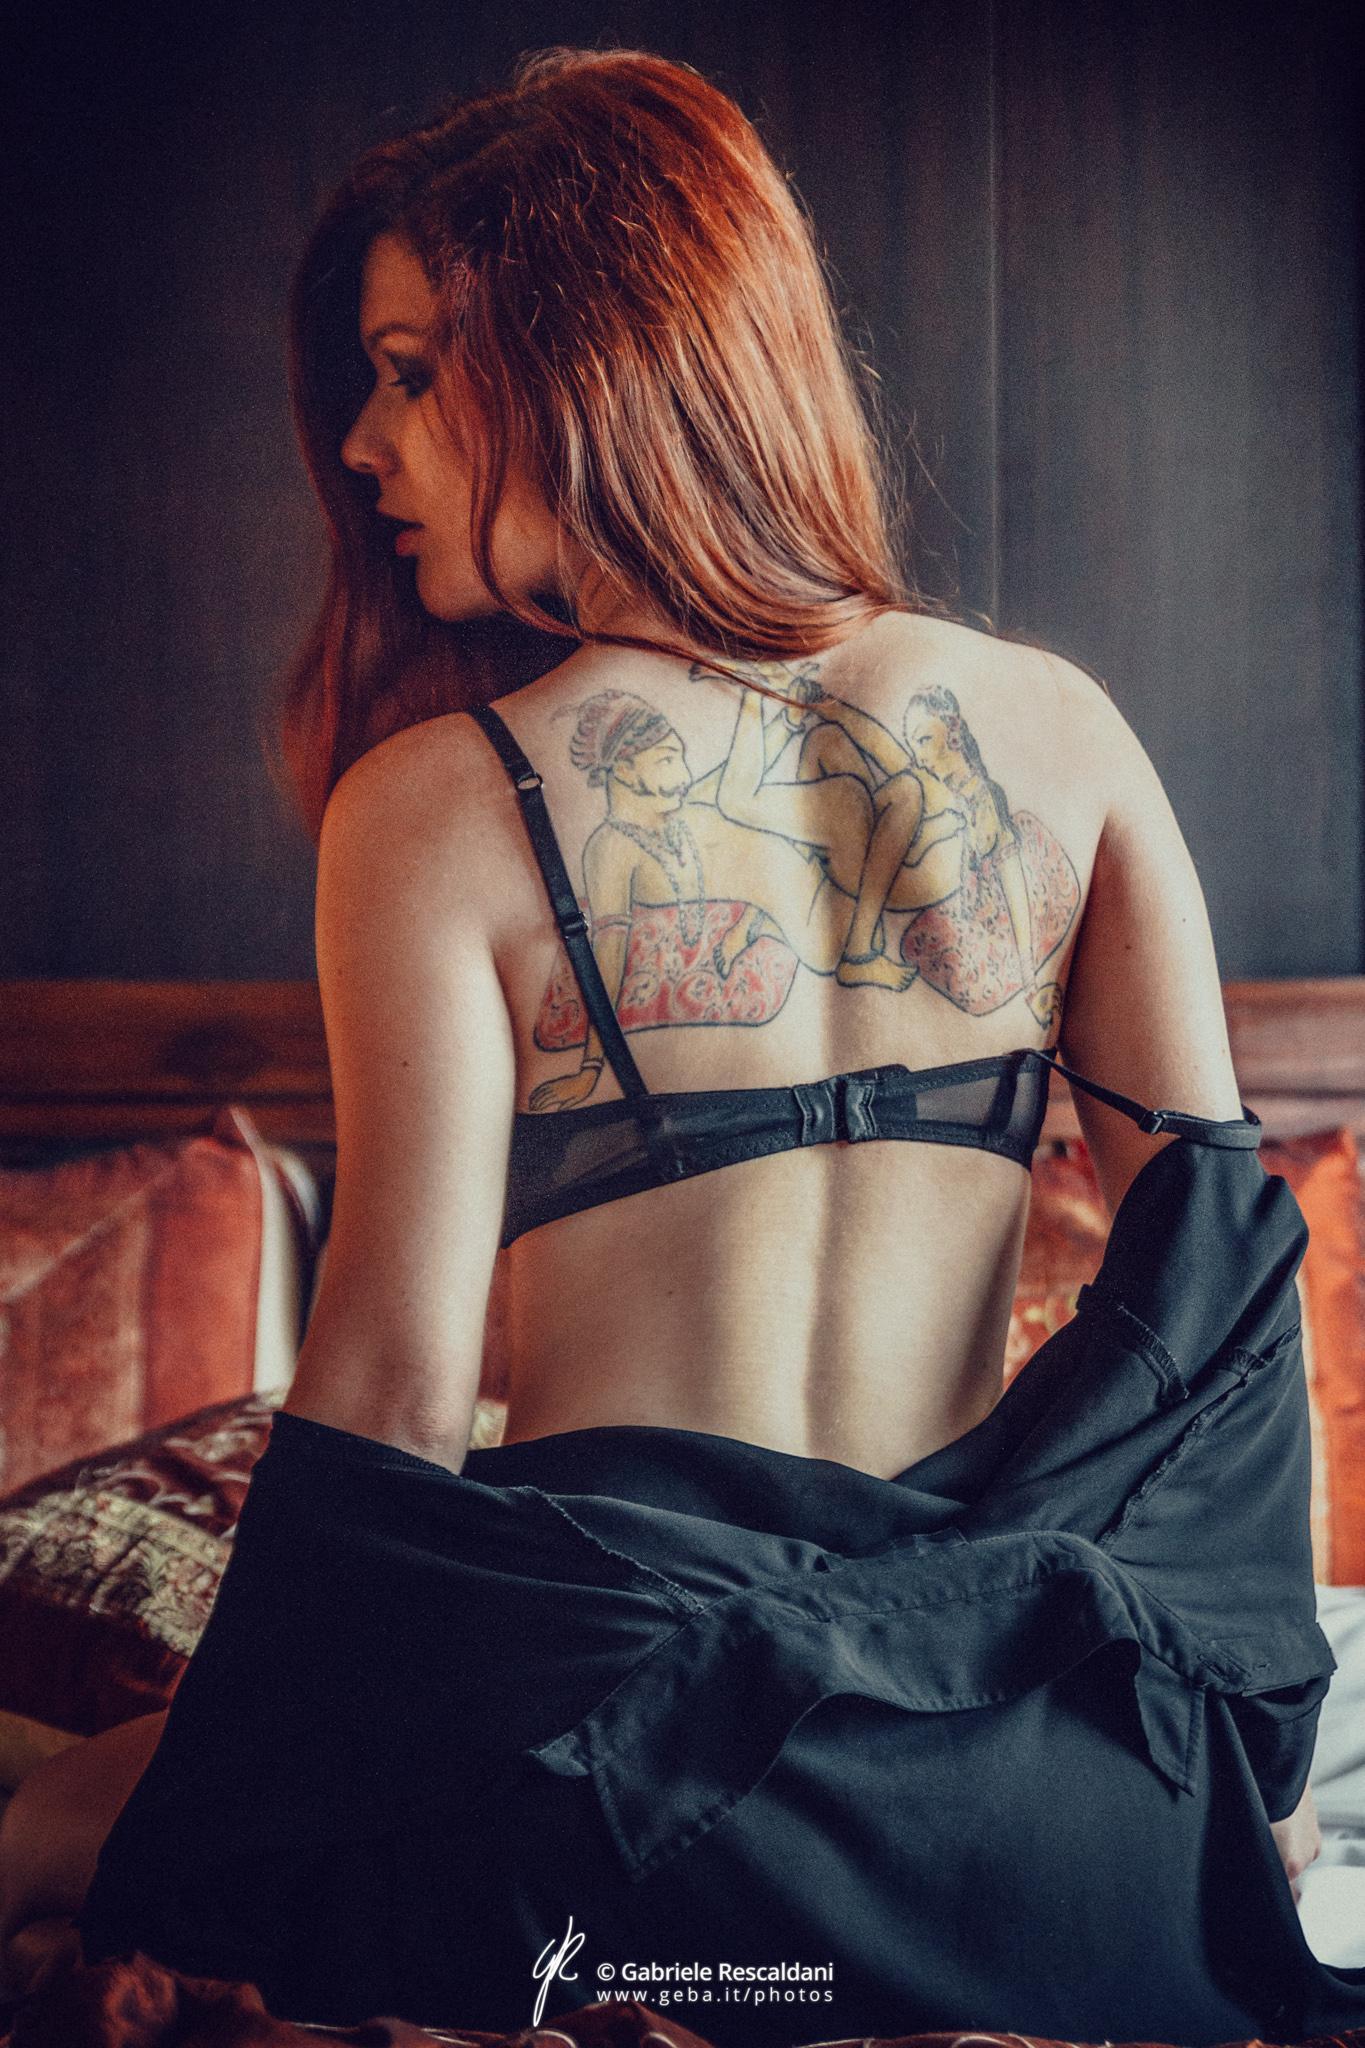 Dirty pages of room 101 / Грязные страницы номера 101 / Gabriele Rescaldani / Mia Sollis